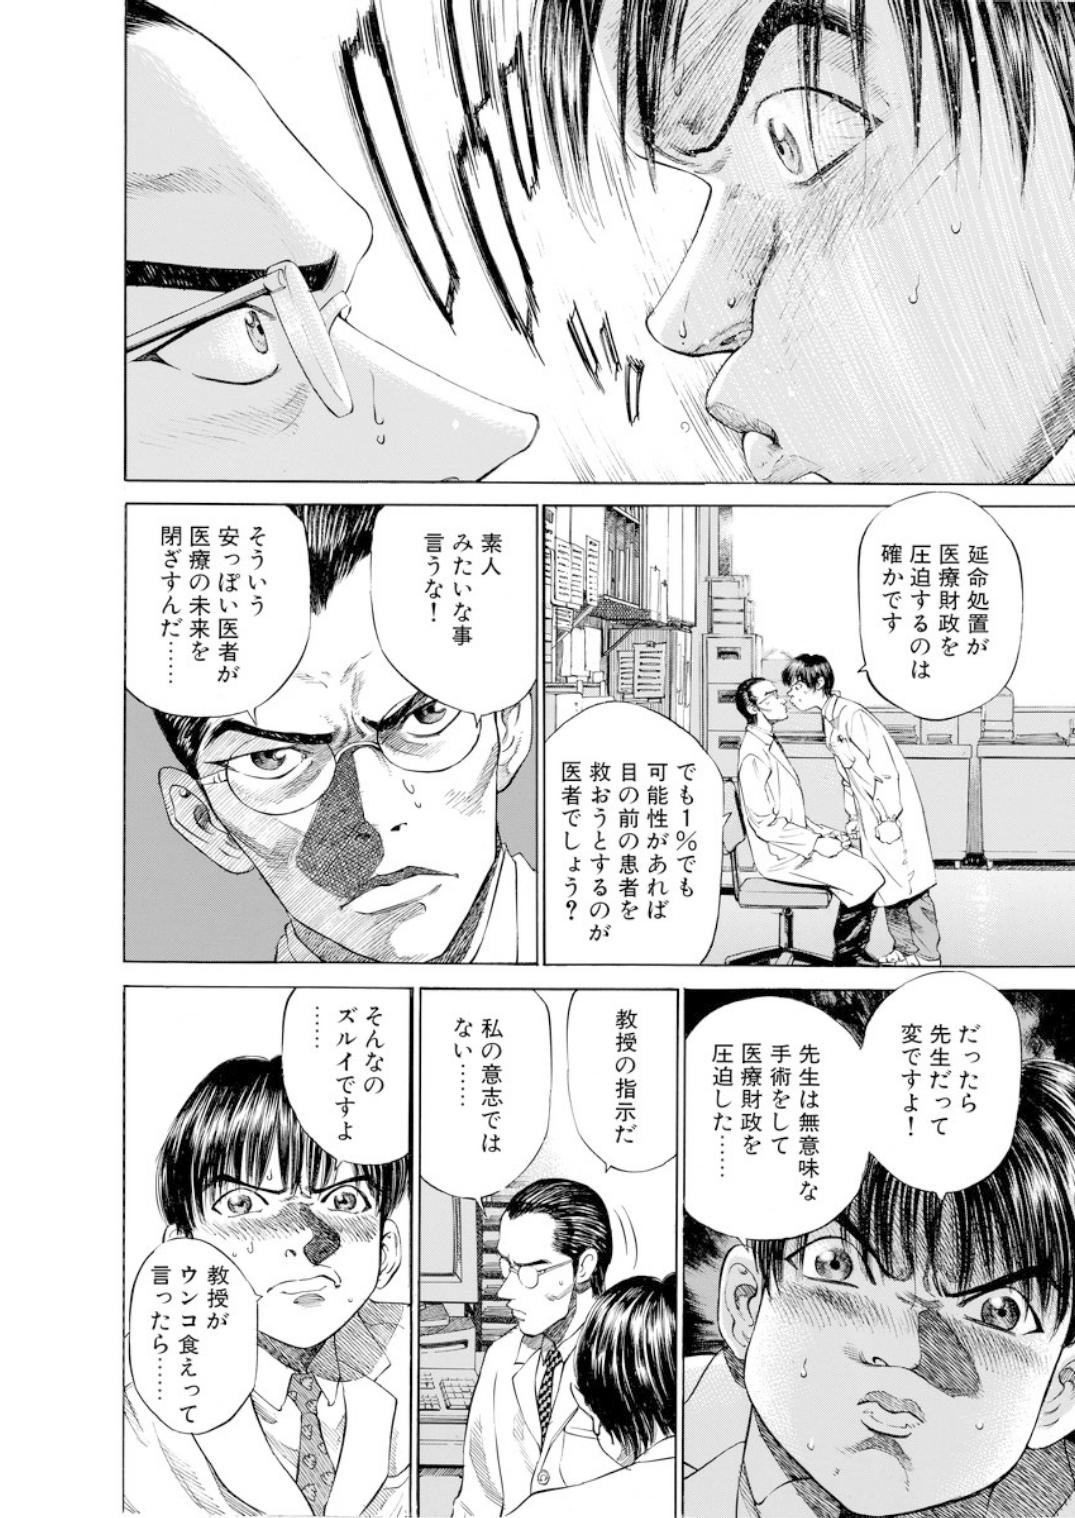 001bj_page-0128.jpg